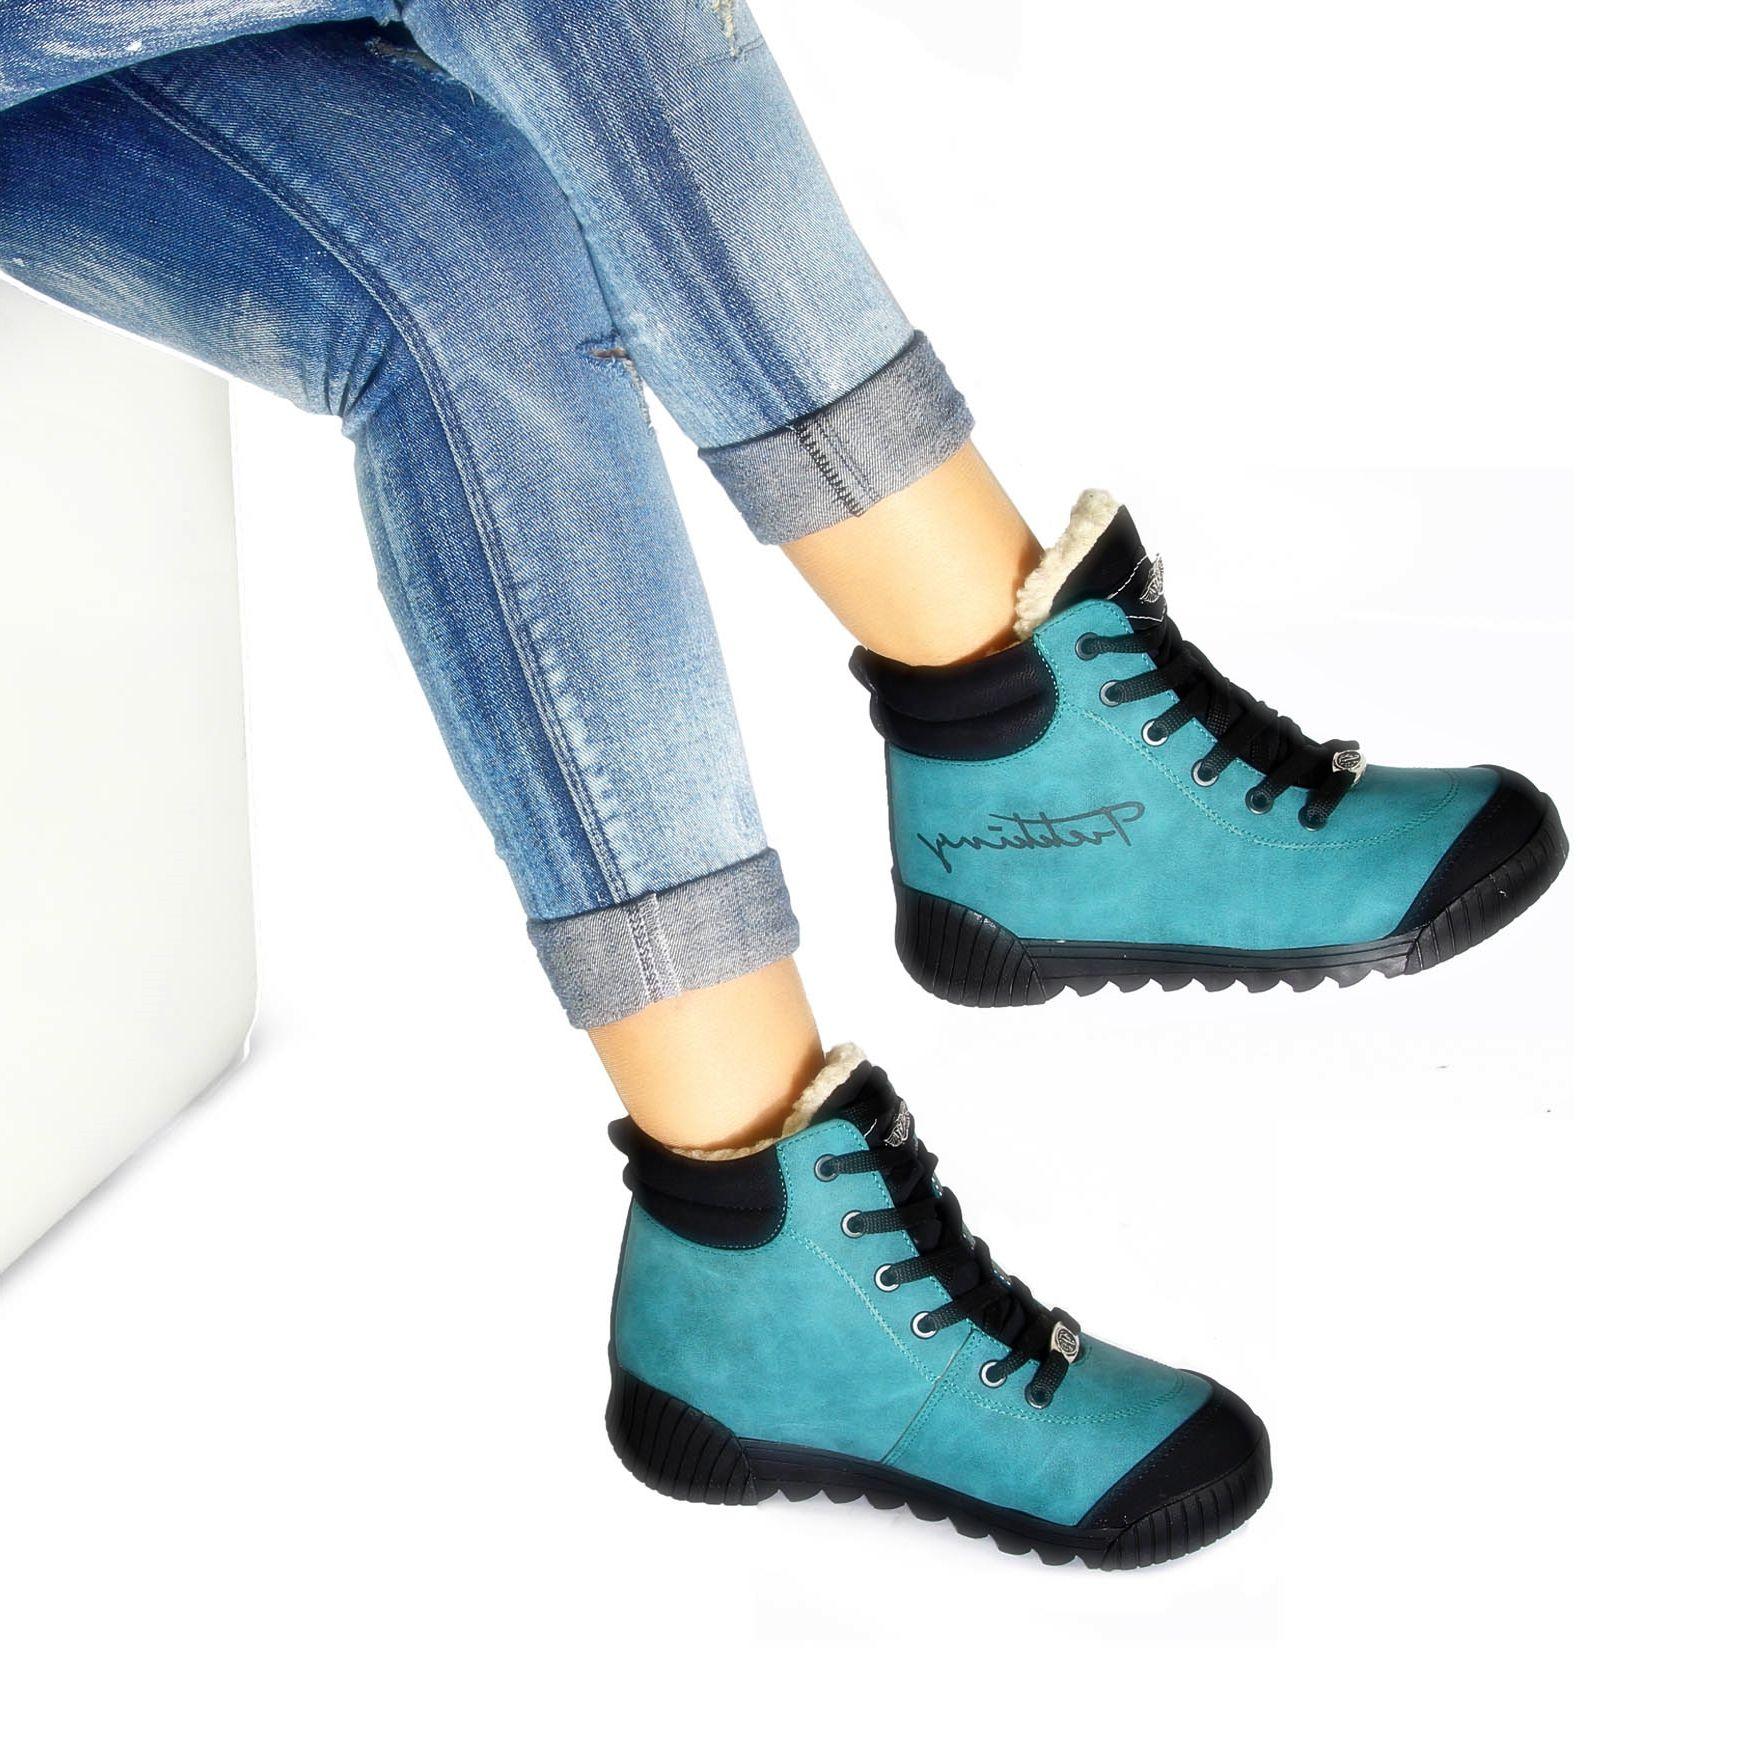 Trekking Botlari Bayan Modelleri Bot Trekking Topuklu Ayakkabilar